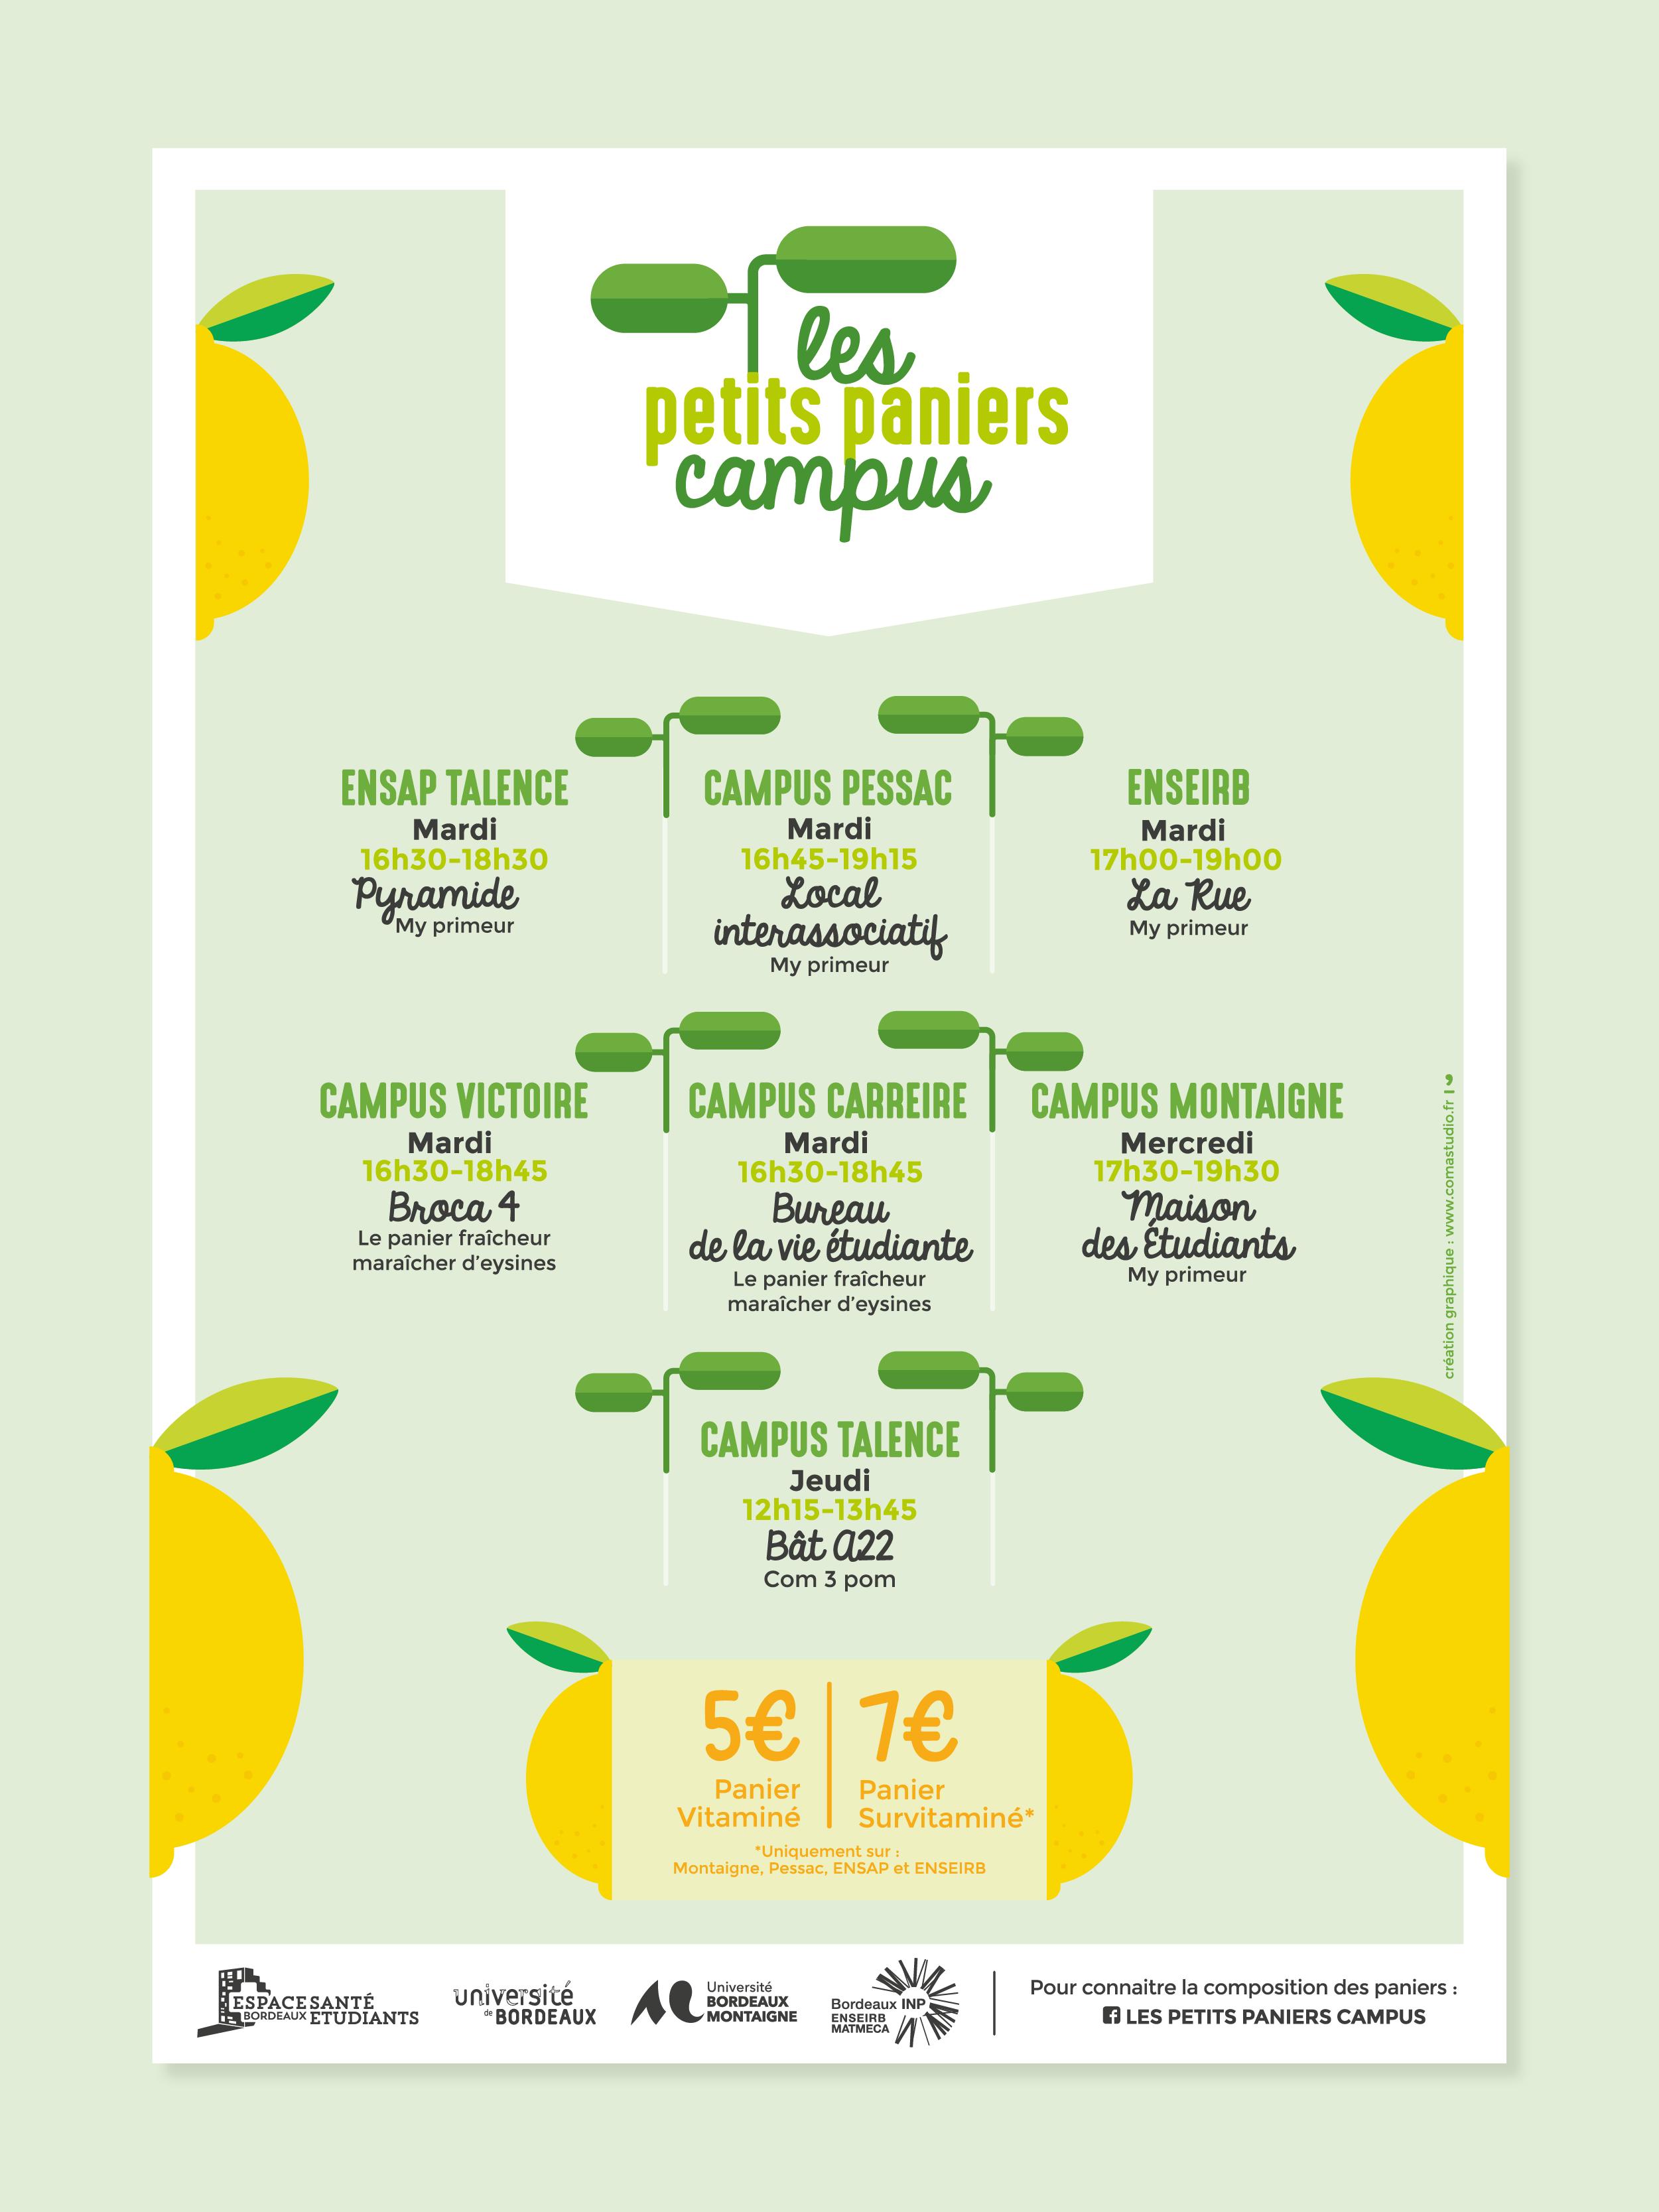 Petitspaniers_print_affiche